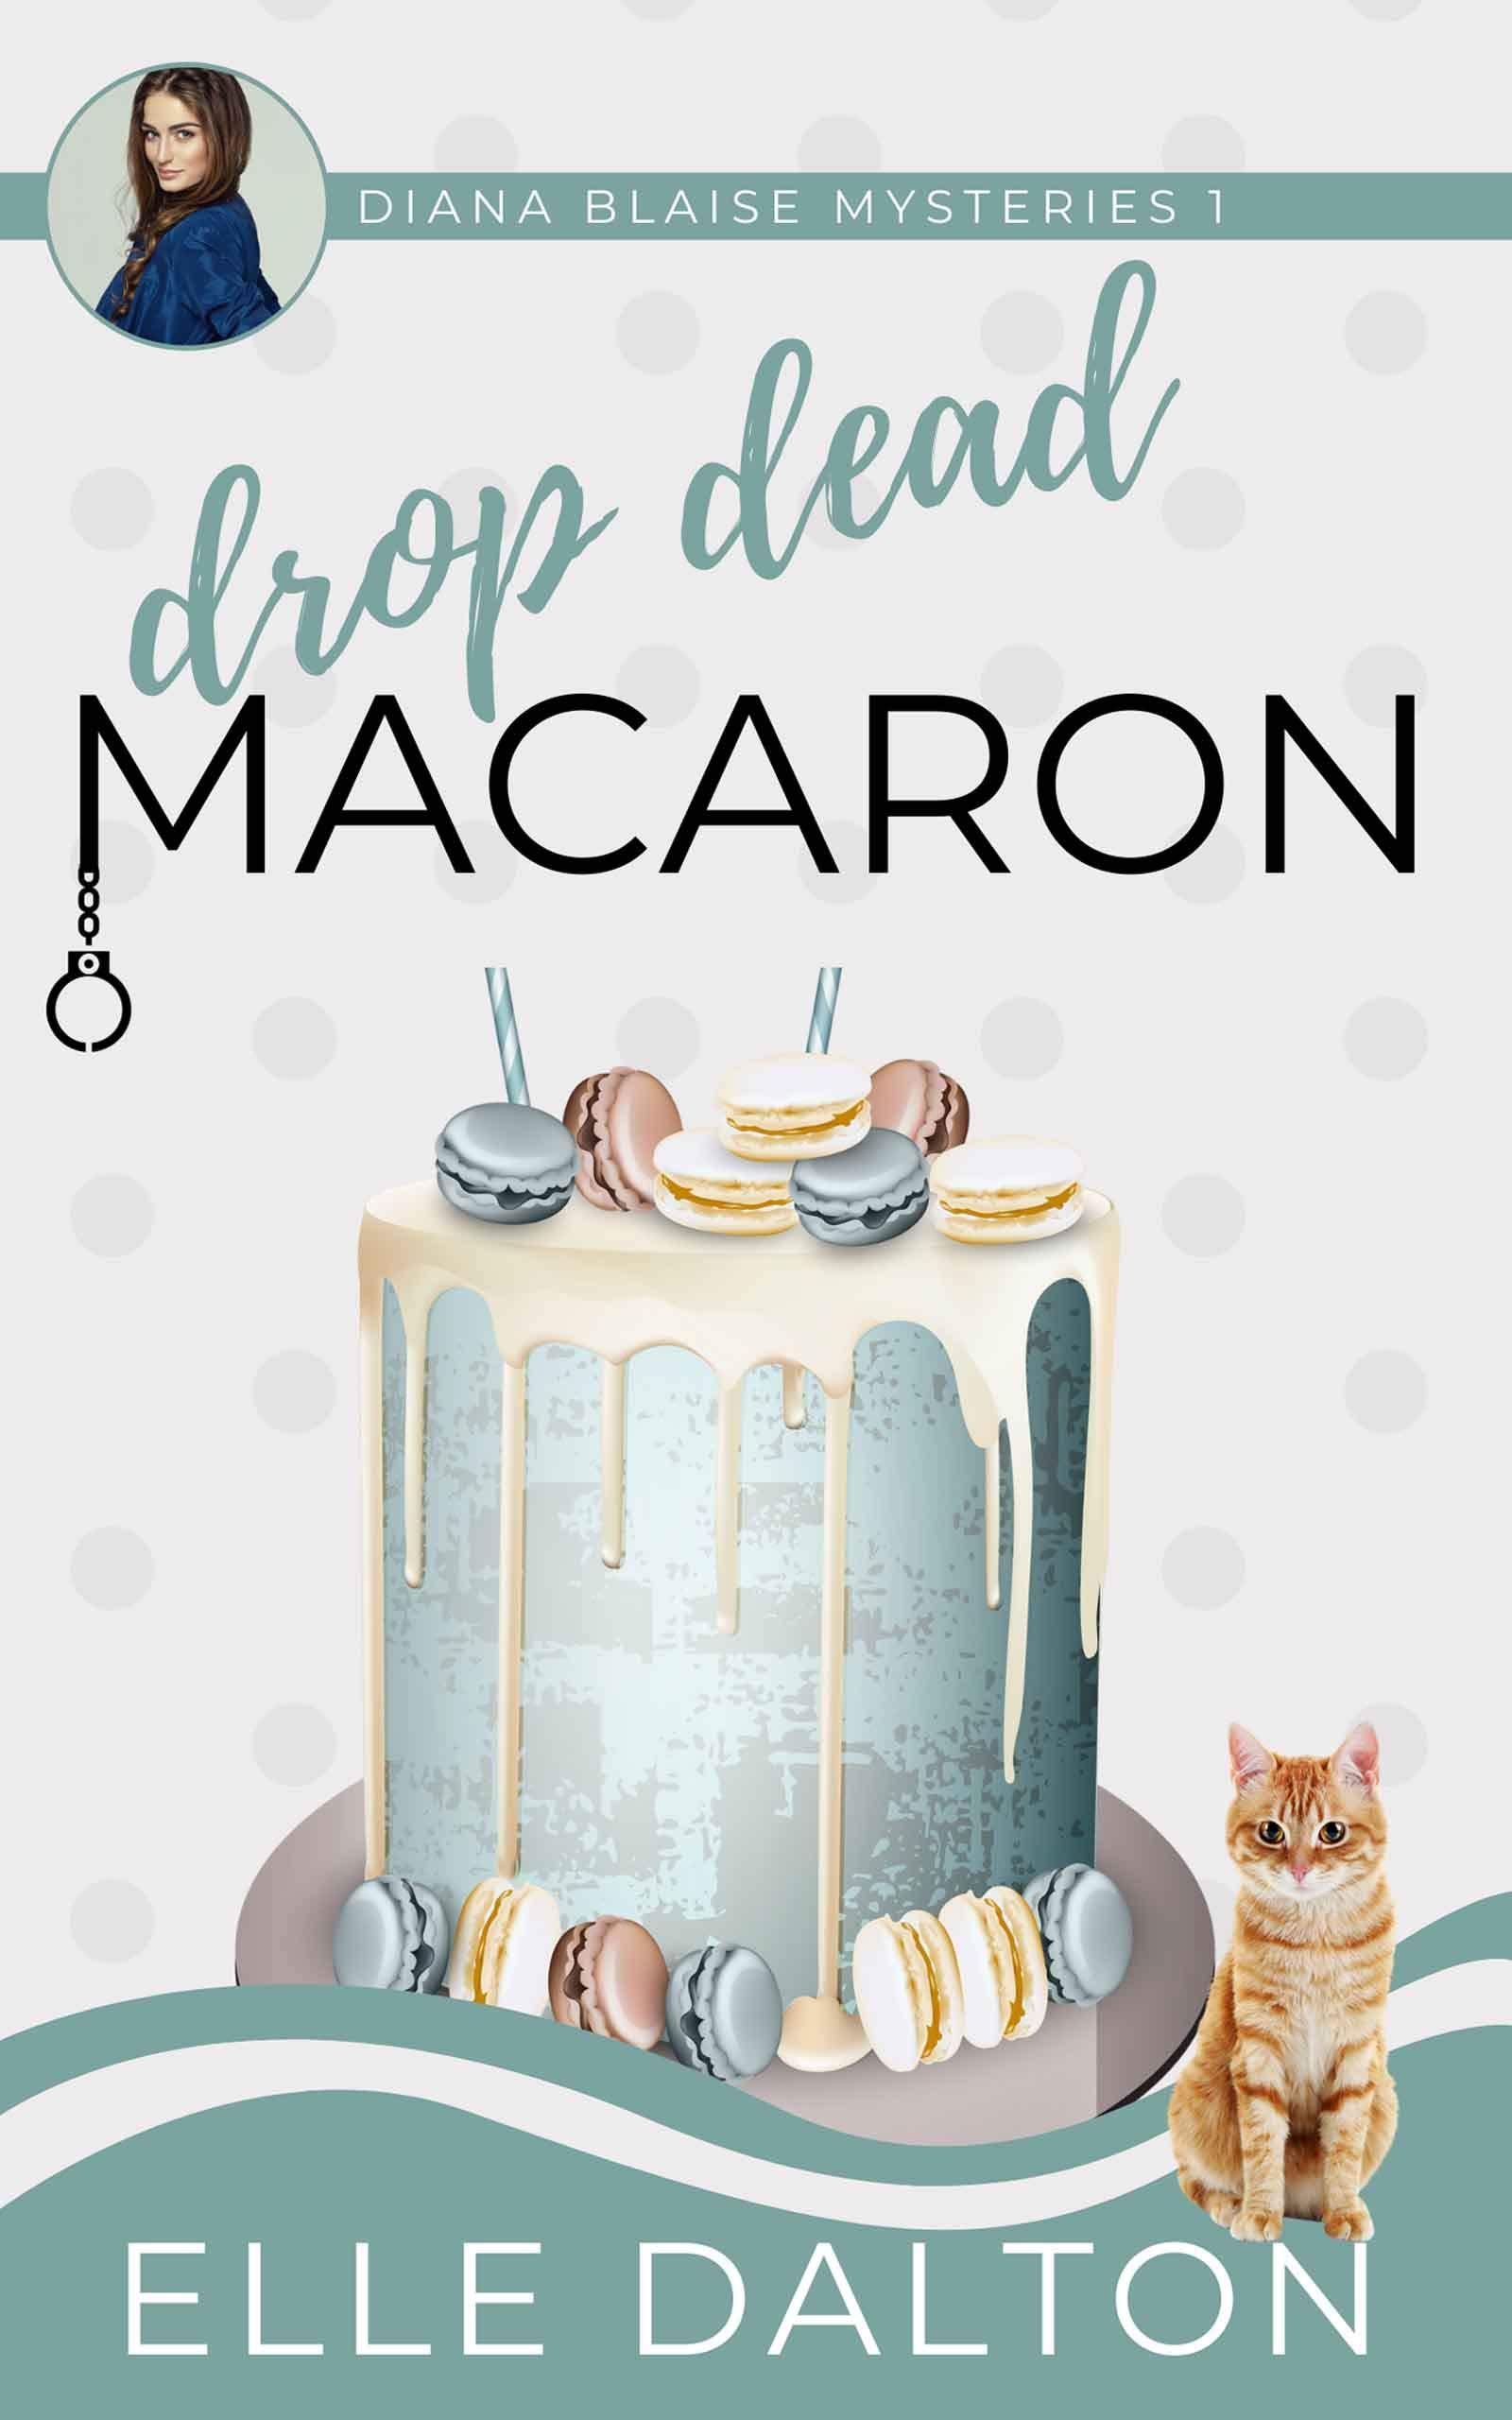 Drop Dead Macaron: A small town cozy mystery (Diana Blaise Mysteries Book 1)